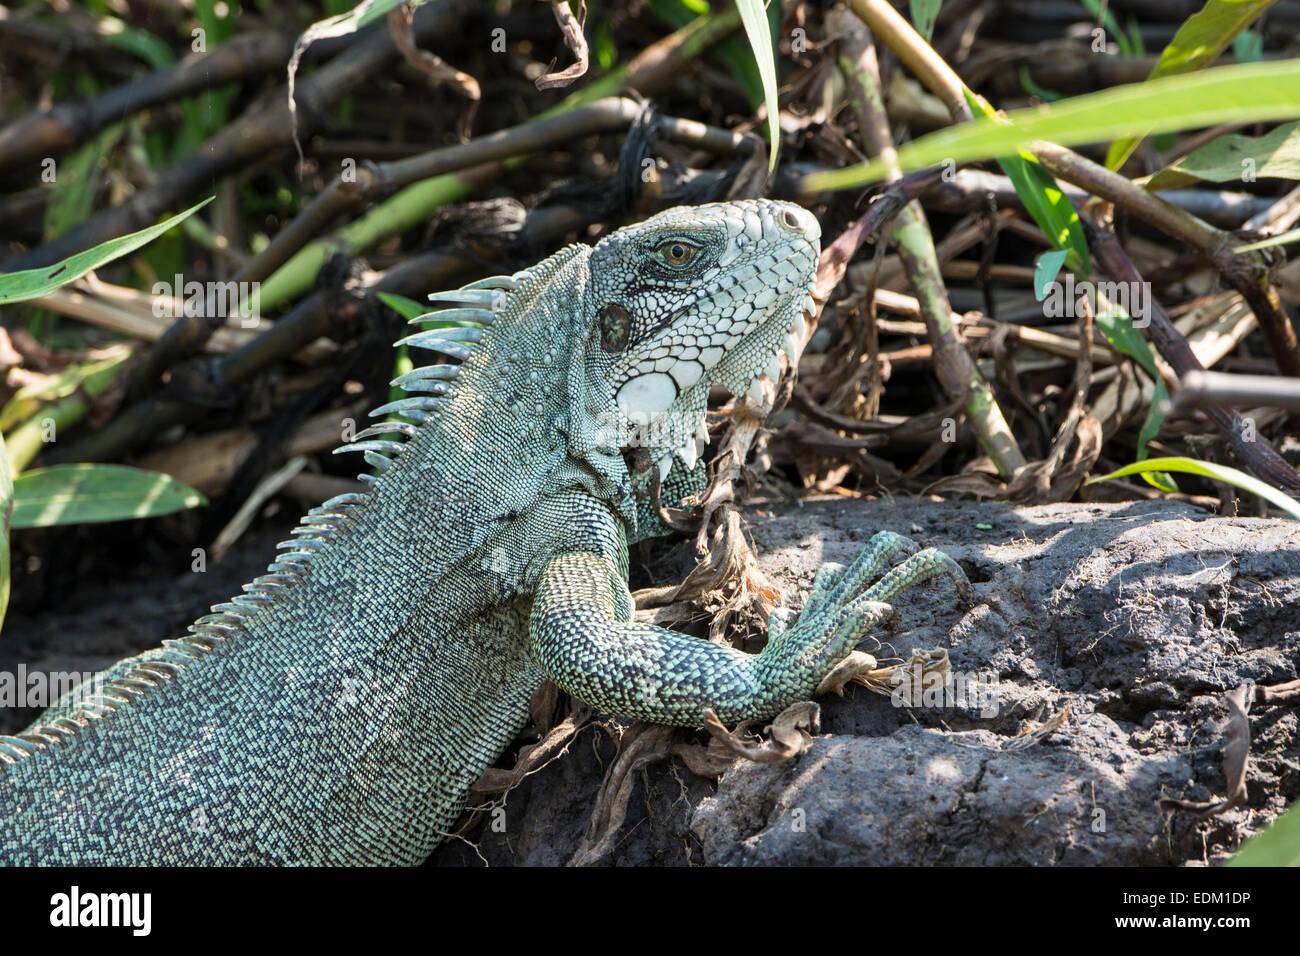 Close Up einer grüner Leguan oder Common Iguana Iguana Iguana, Pantanal, Mato Grosso, Brasilien, Südamerika Stockfoto